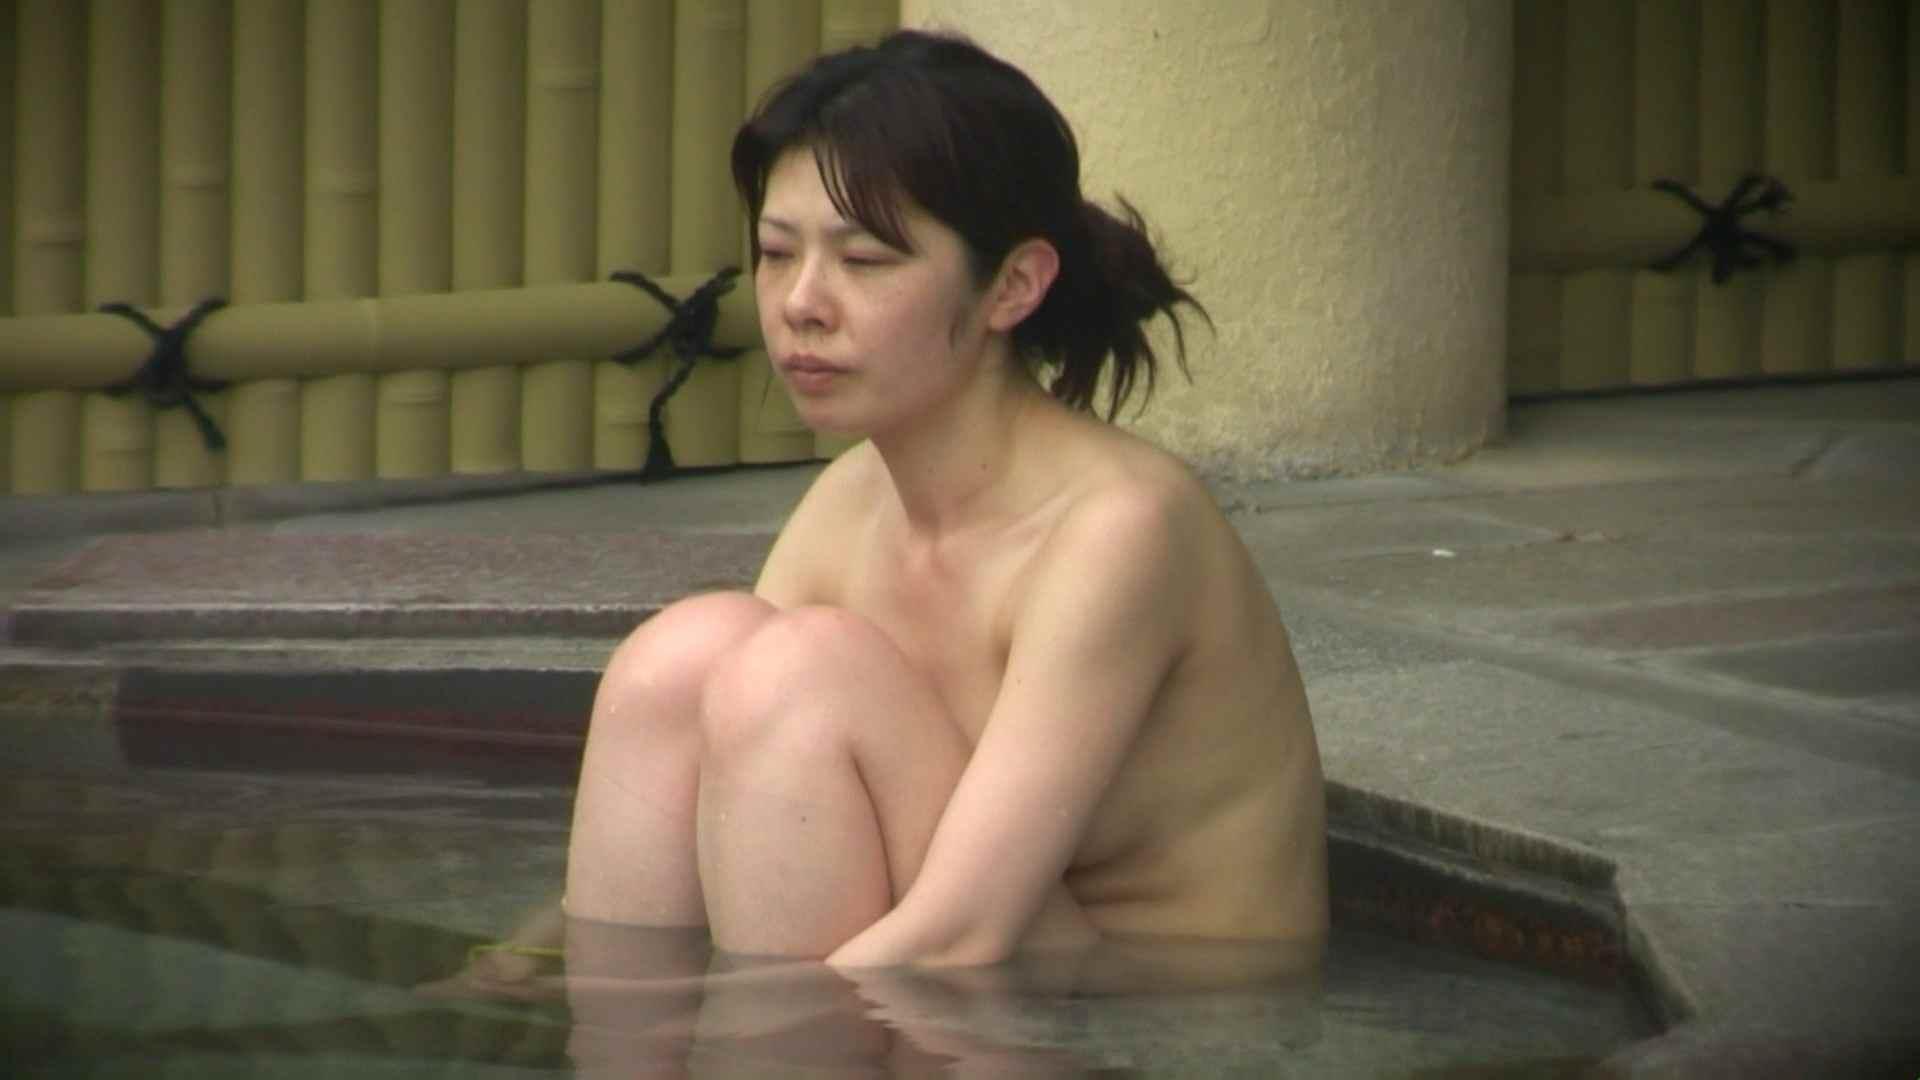 Aquaな露天風呂Vol.676 盗撮シリーズ | 露天風呂編  83PIX 27